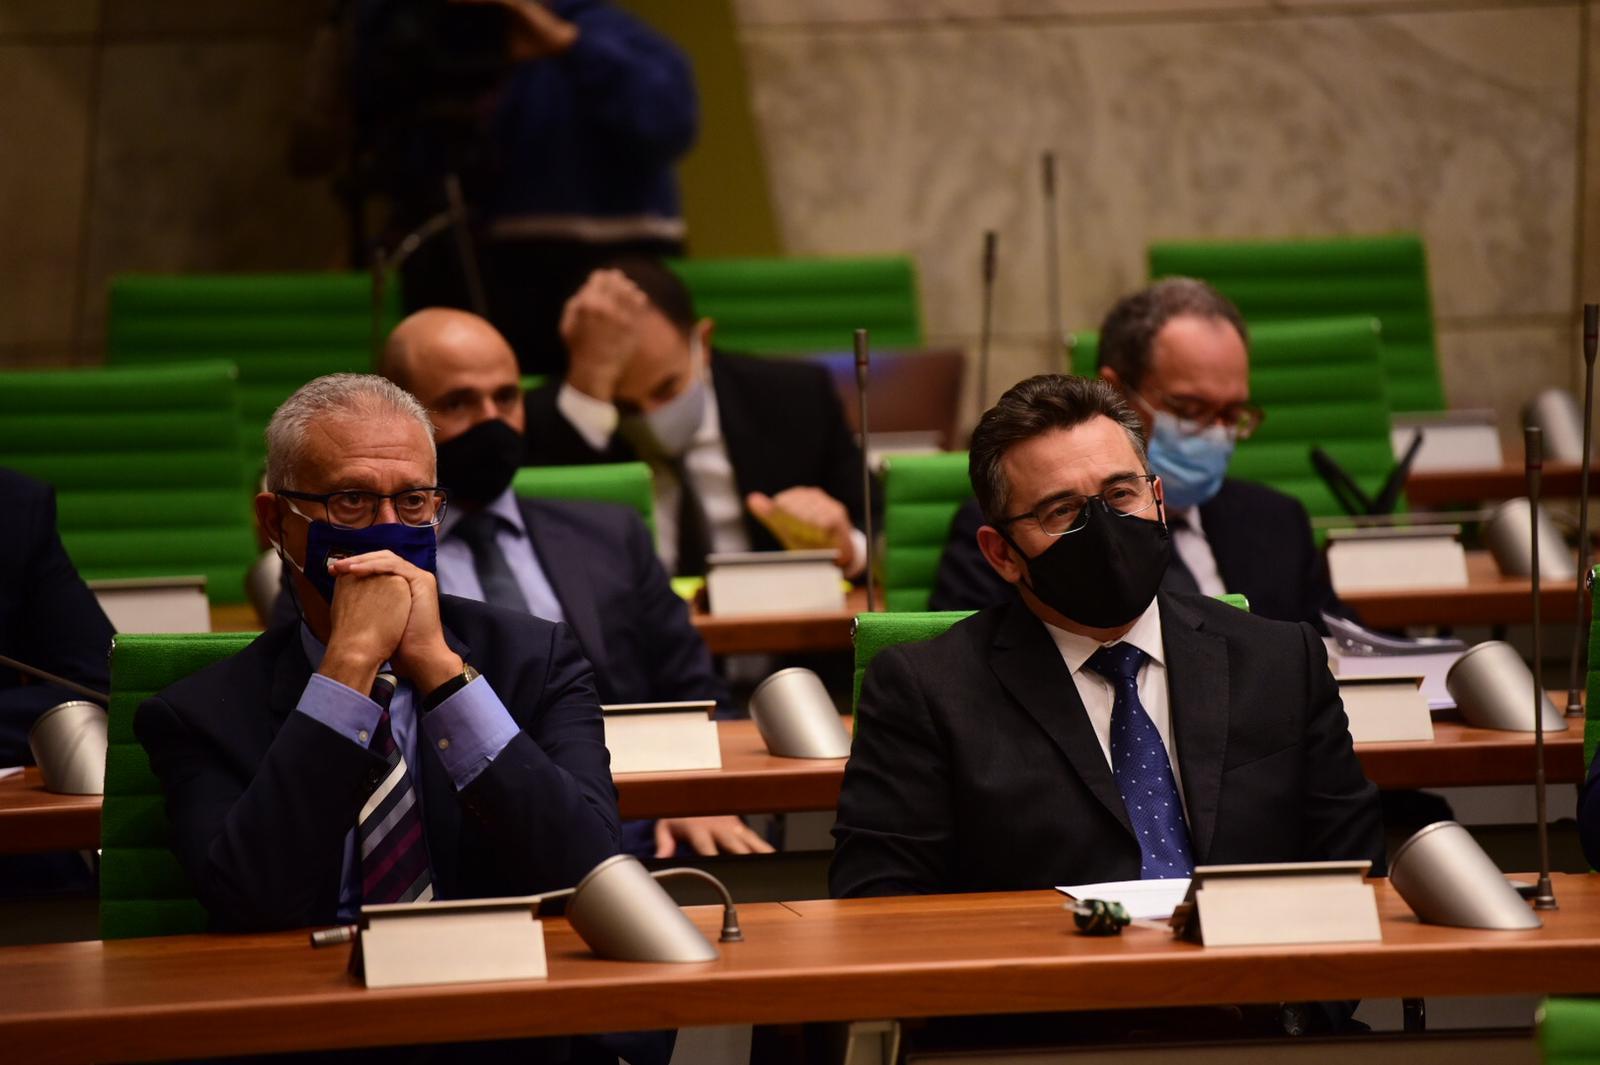 Opposition leader Bernard Grech (right) listens to Robert Abela deliver his speech. Photo: Mark Zammit Cordina